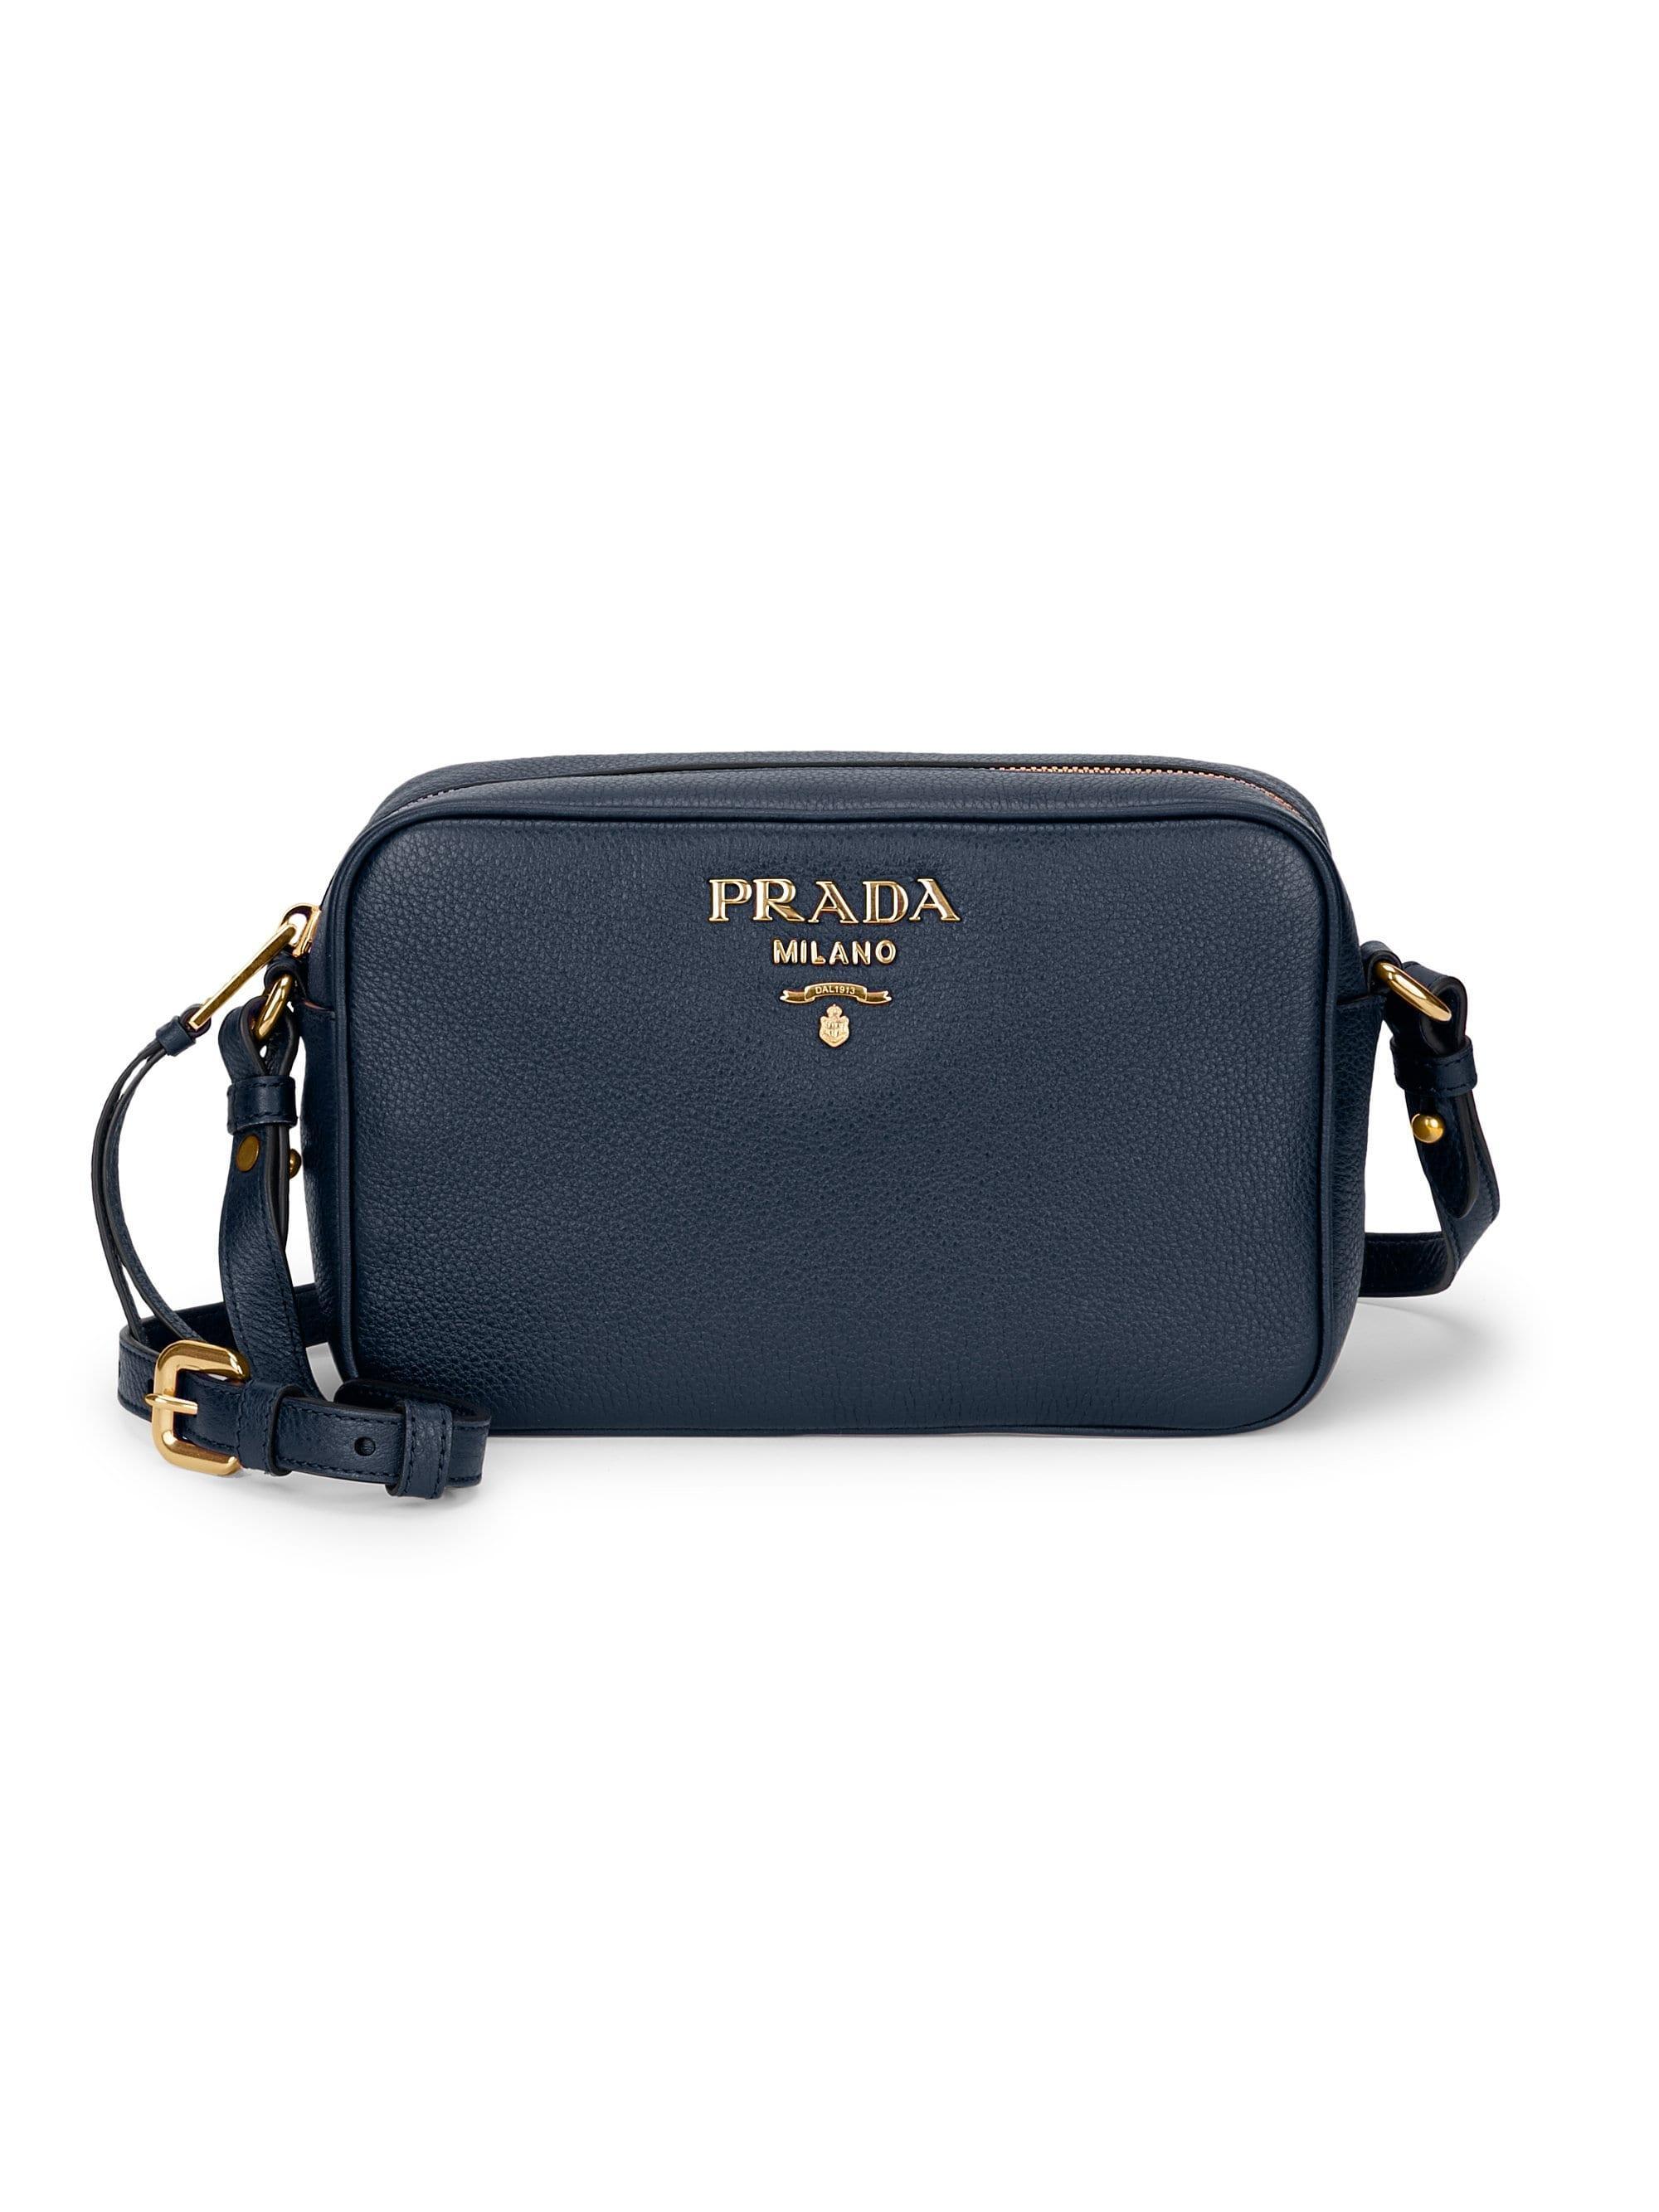 eb34109f83 Lyst - Prada Daino Textured Leather Mini Crossbody Bag in Blue